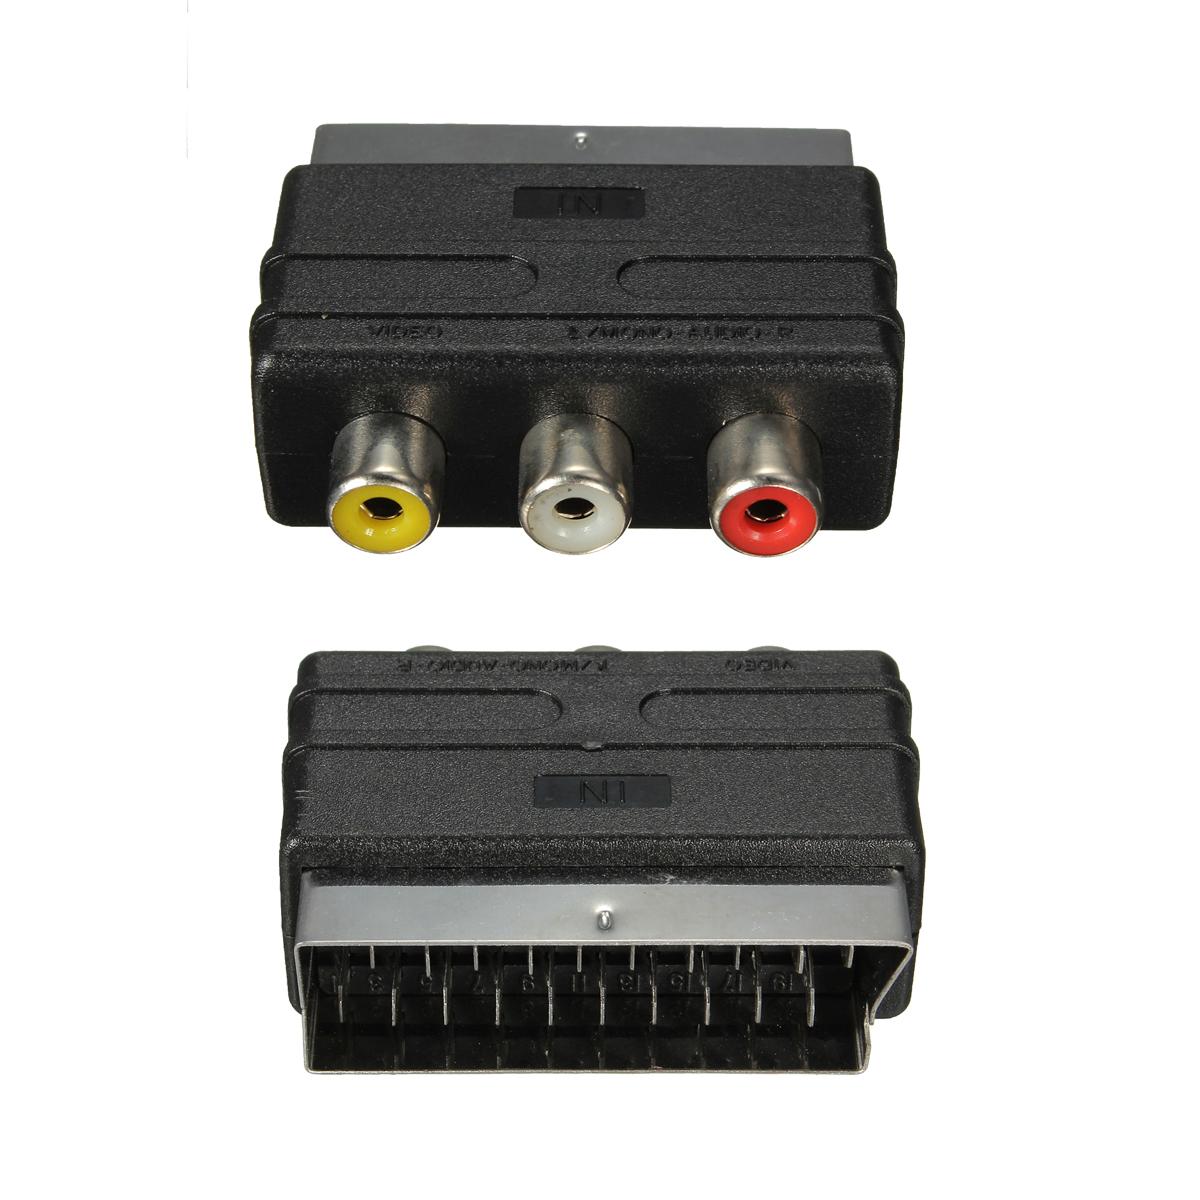 audio video av adapter cinch kabel hdmi stecker auf 3 rca f r hdtv 1080p ebay. Black Bedroom Furniture Sets. Home Design Ideas